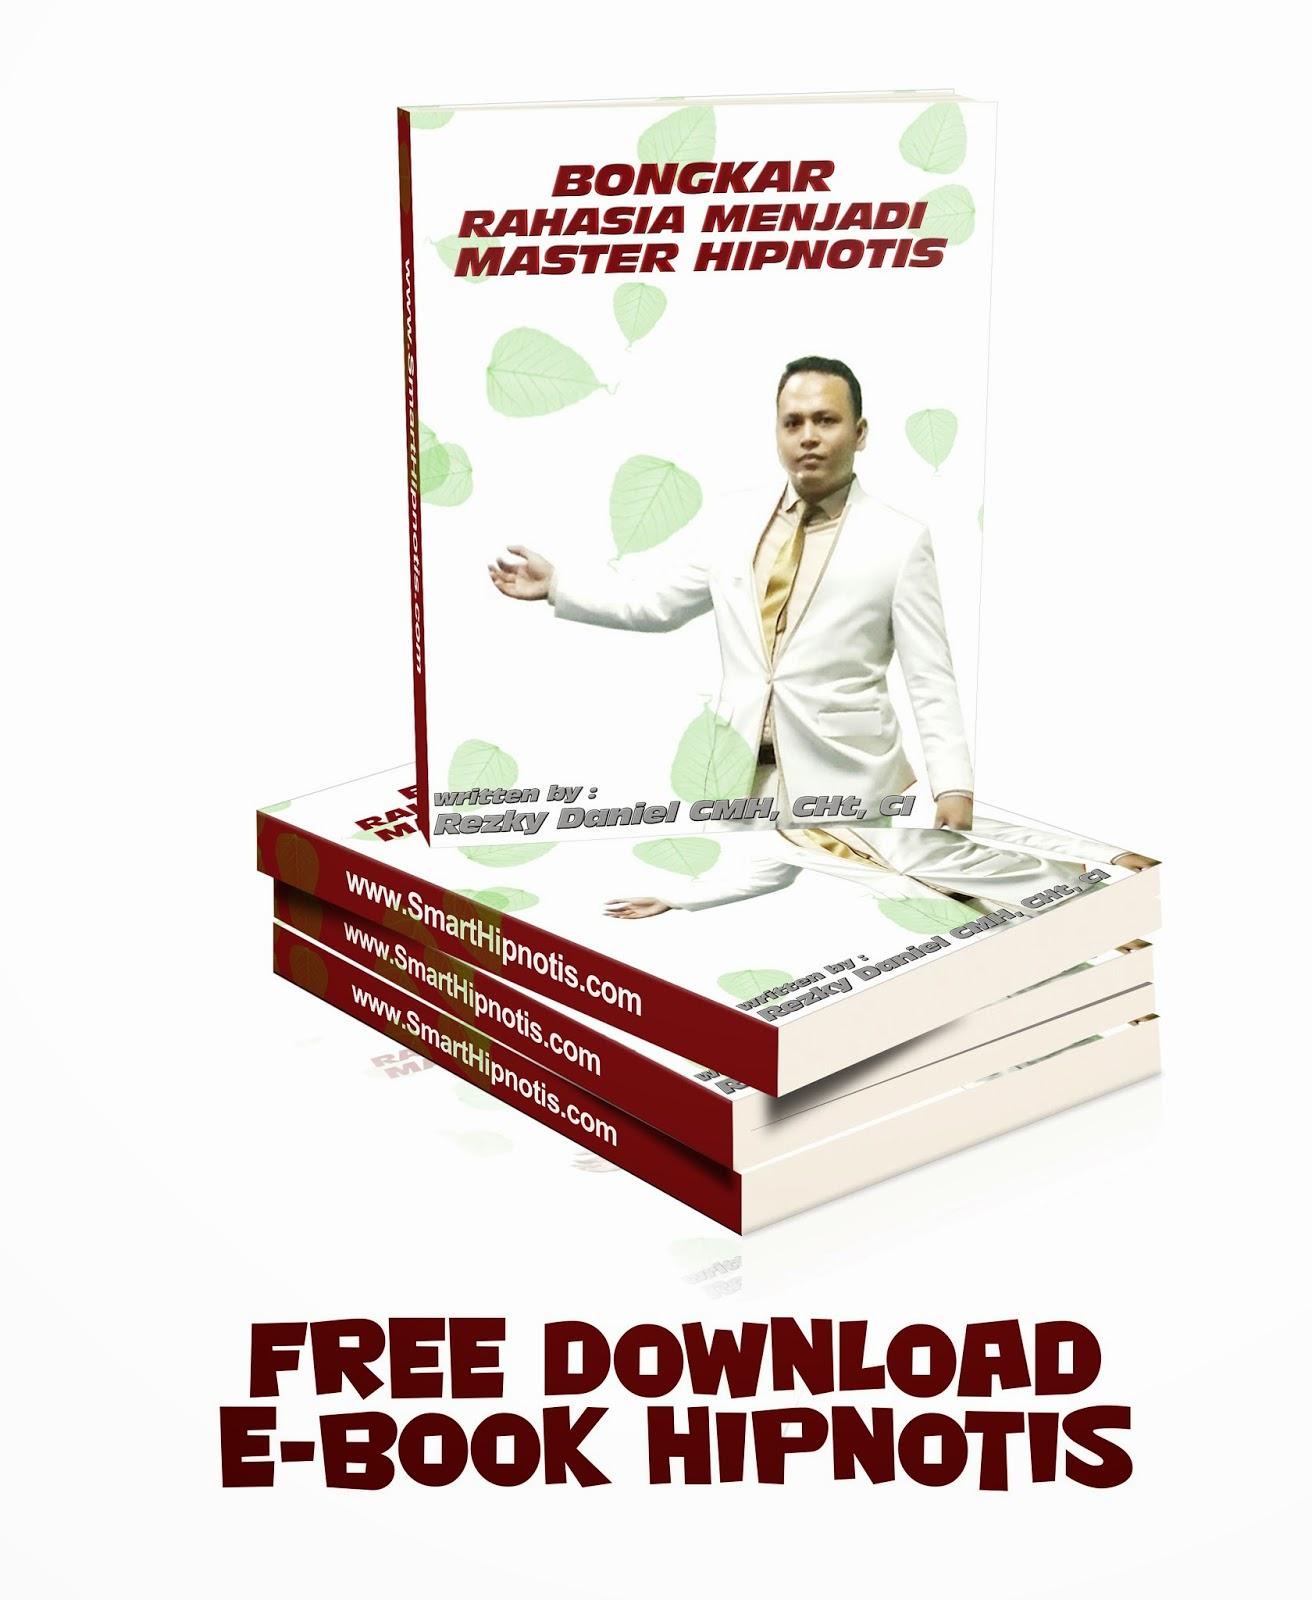 http://www.smarthipnotis.com/p/blog-page_21.html